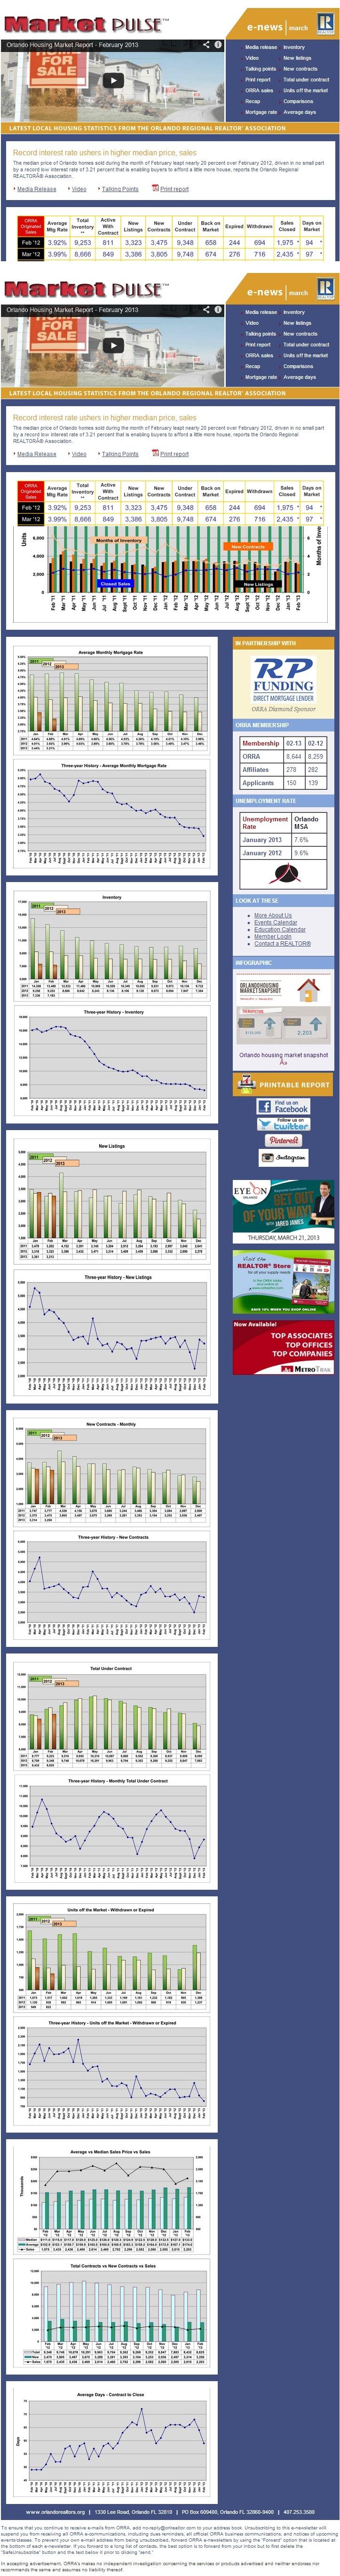 Nfl lines week 13 bleacher report